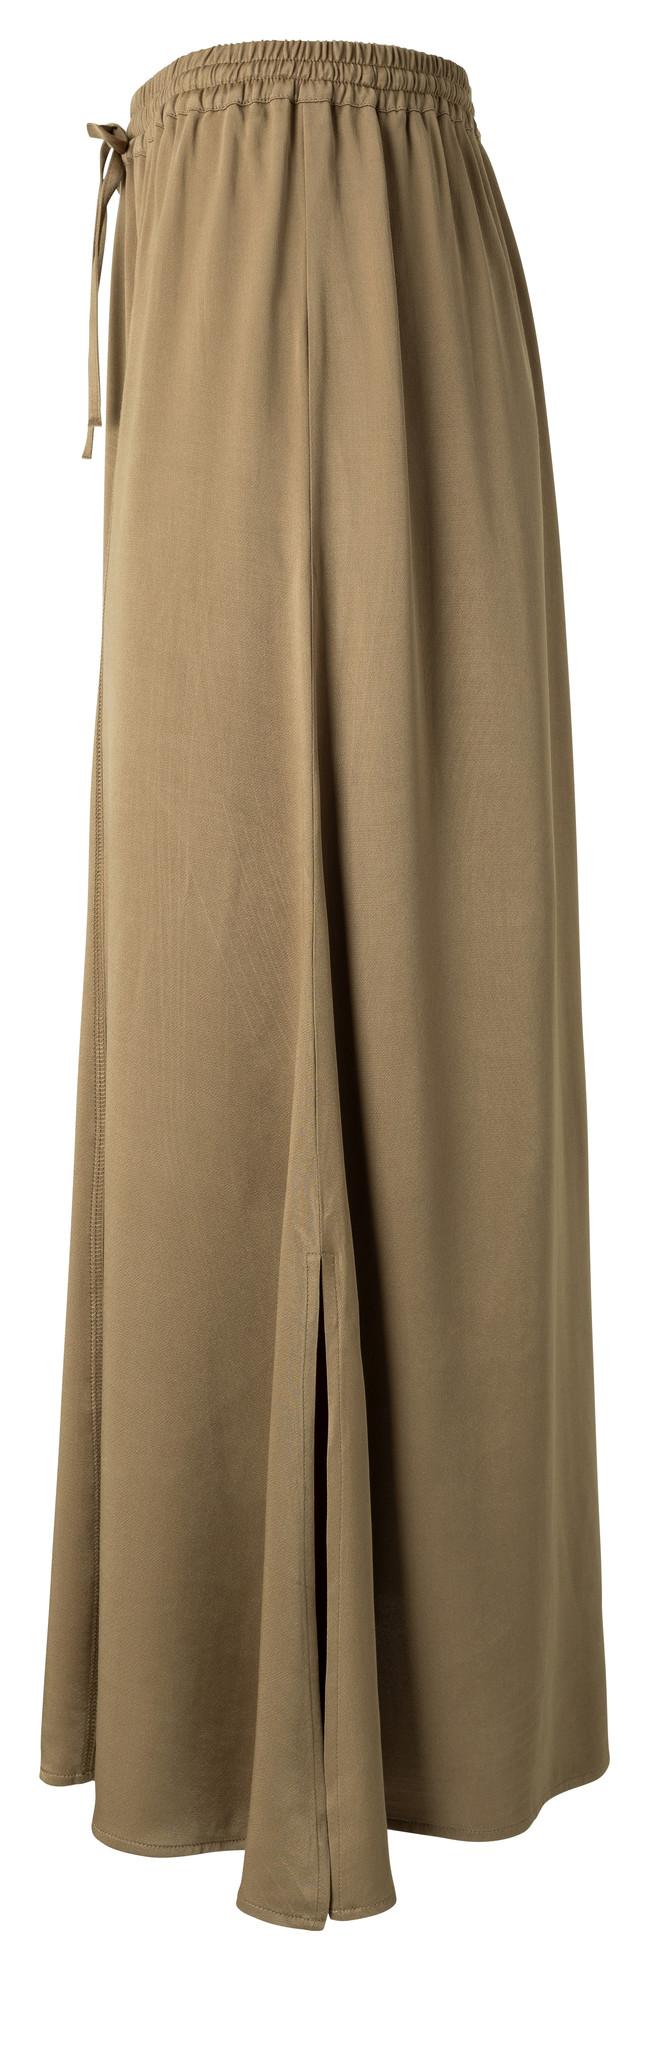 yaya Satin skirt elastic 1401134-113-2